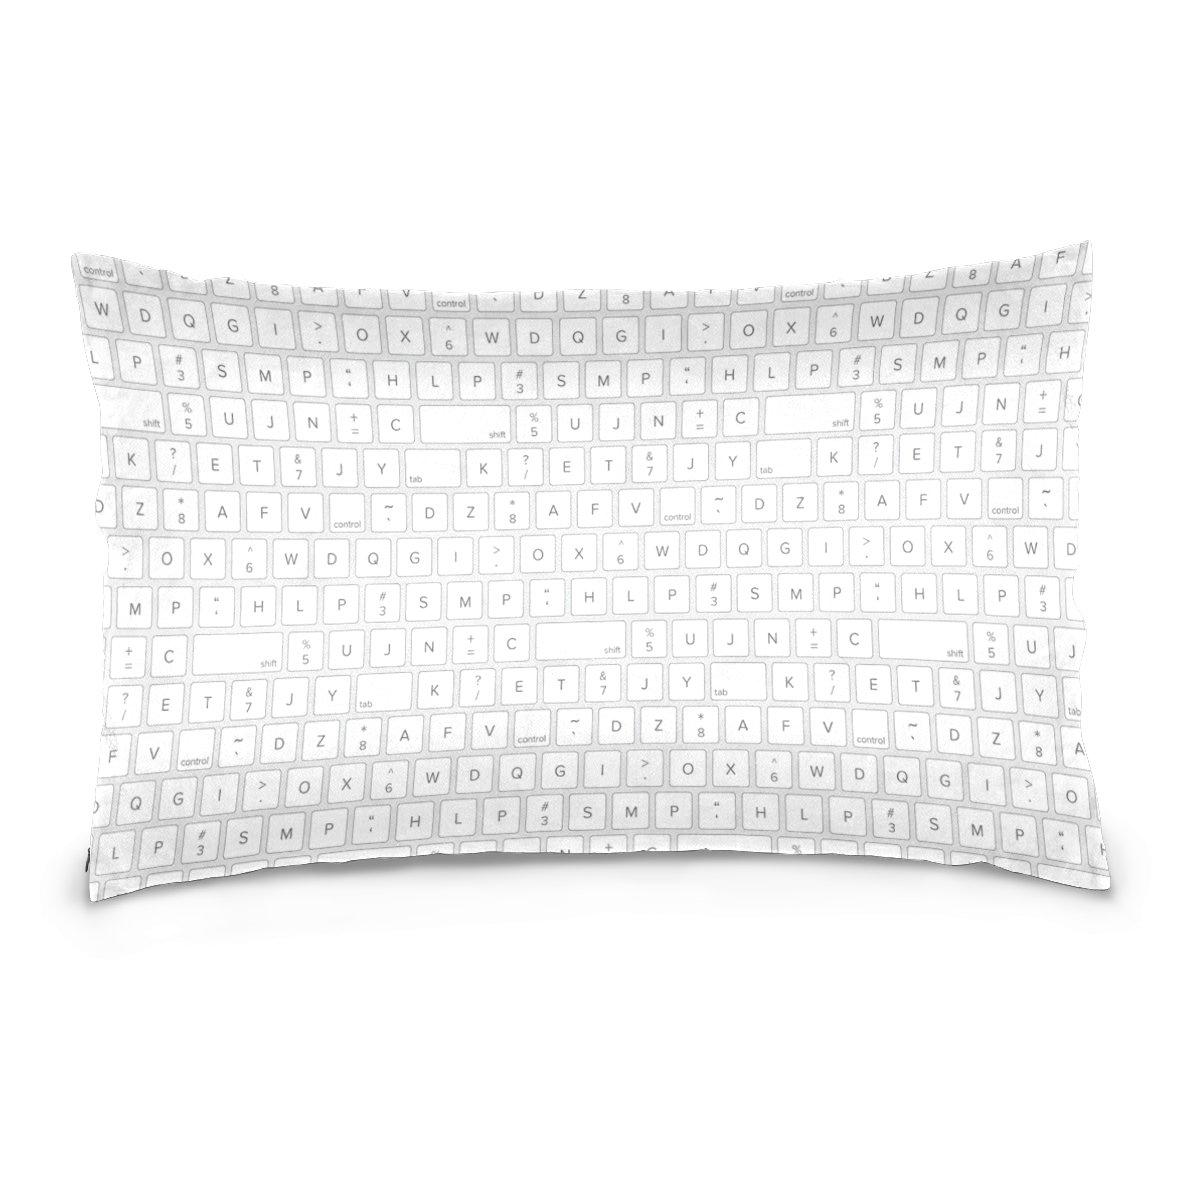 DJROW Technology Keyboard Pillow Cover on Both Sides Throw Pillow Sham Toss Pillow Case